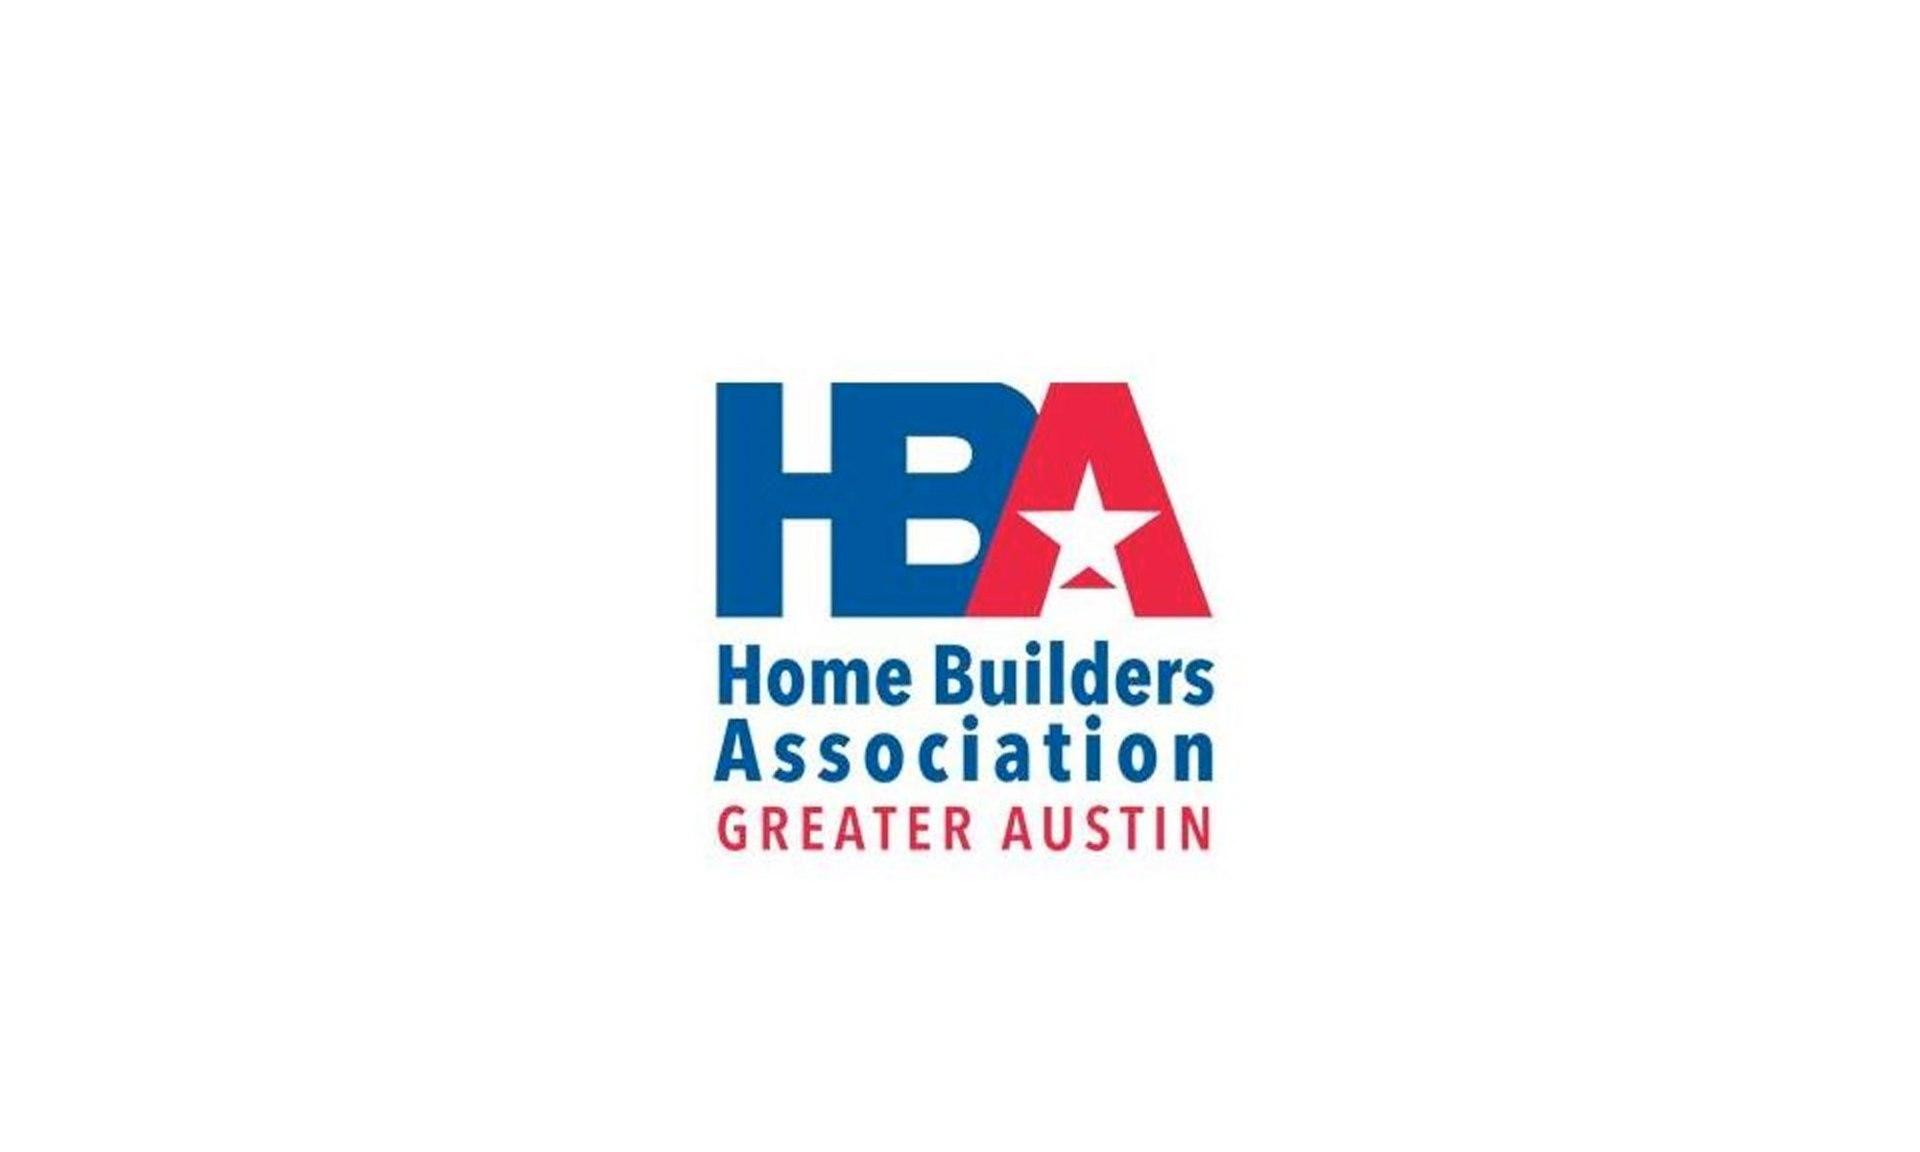 Home Builders Association Greater Austin